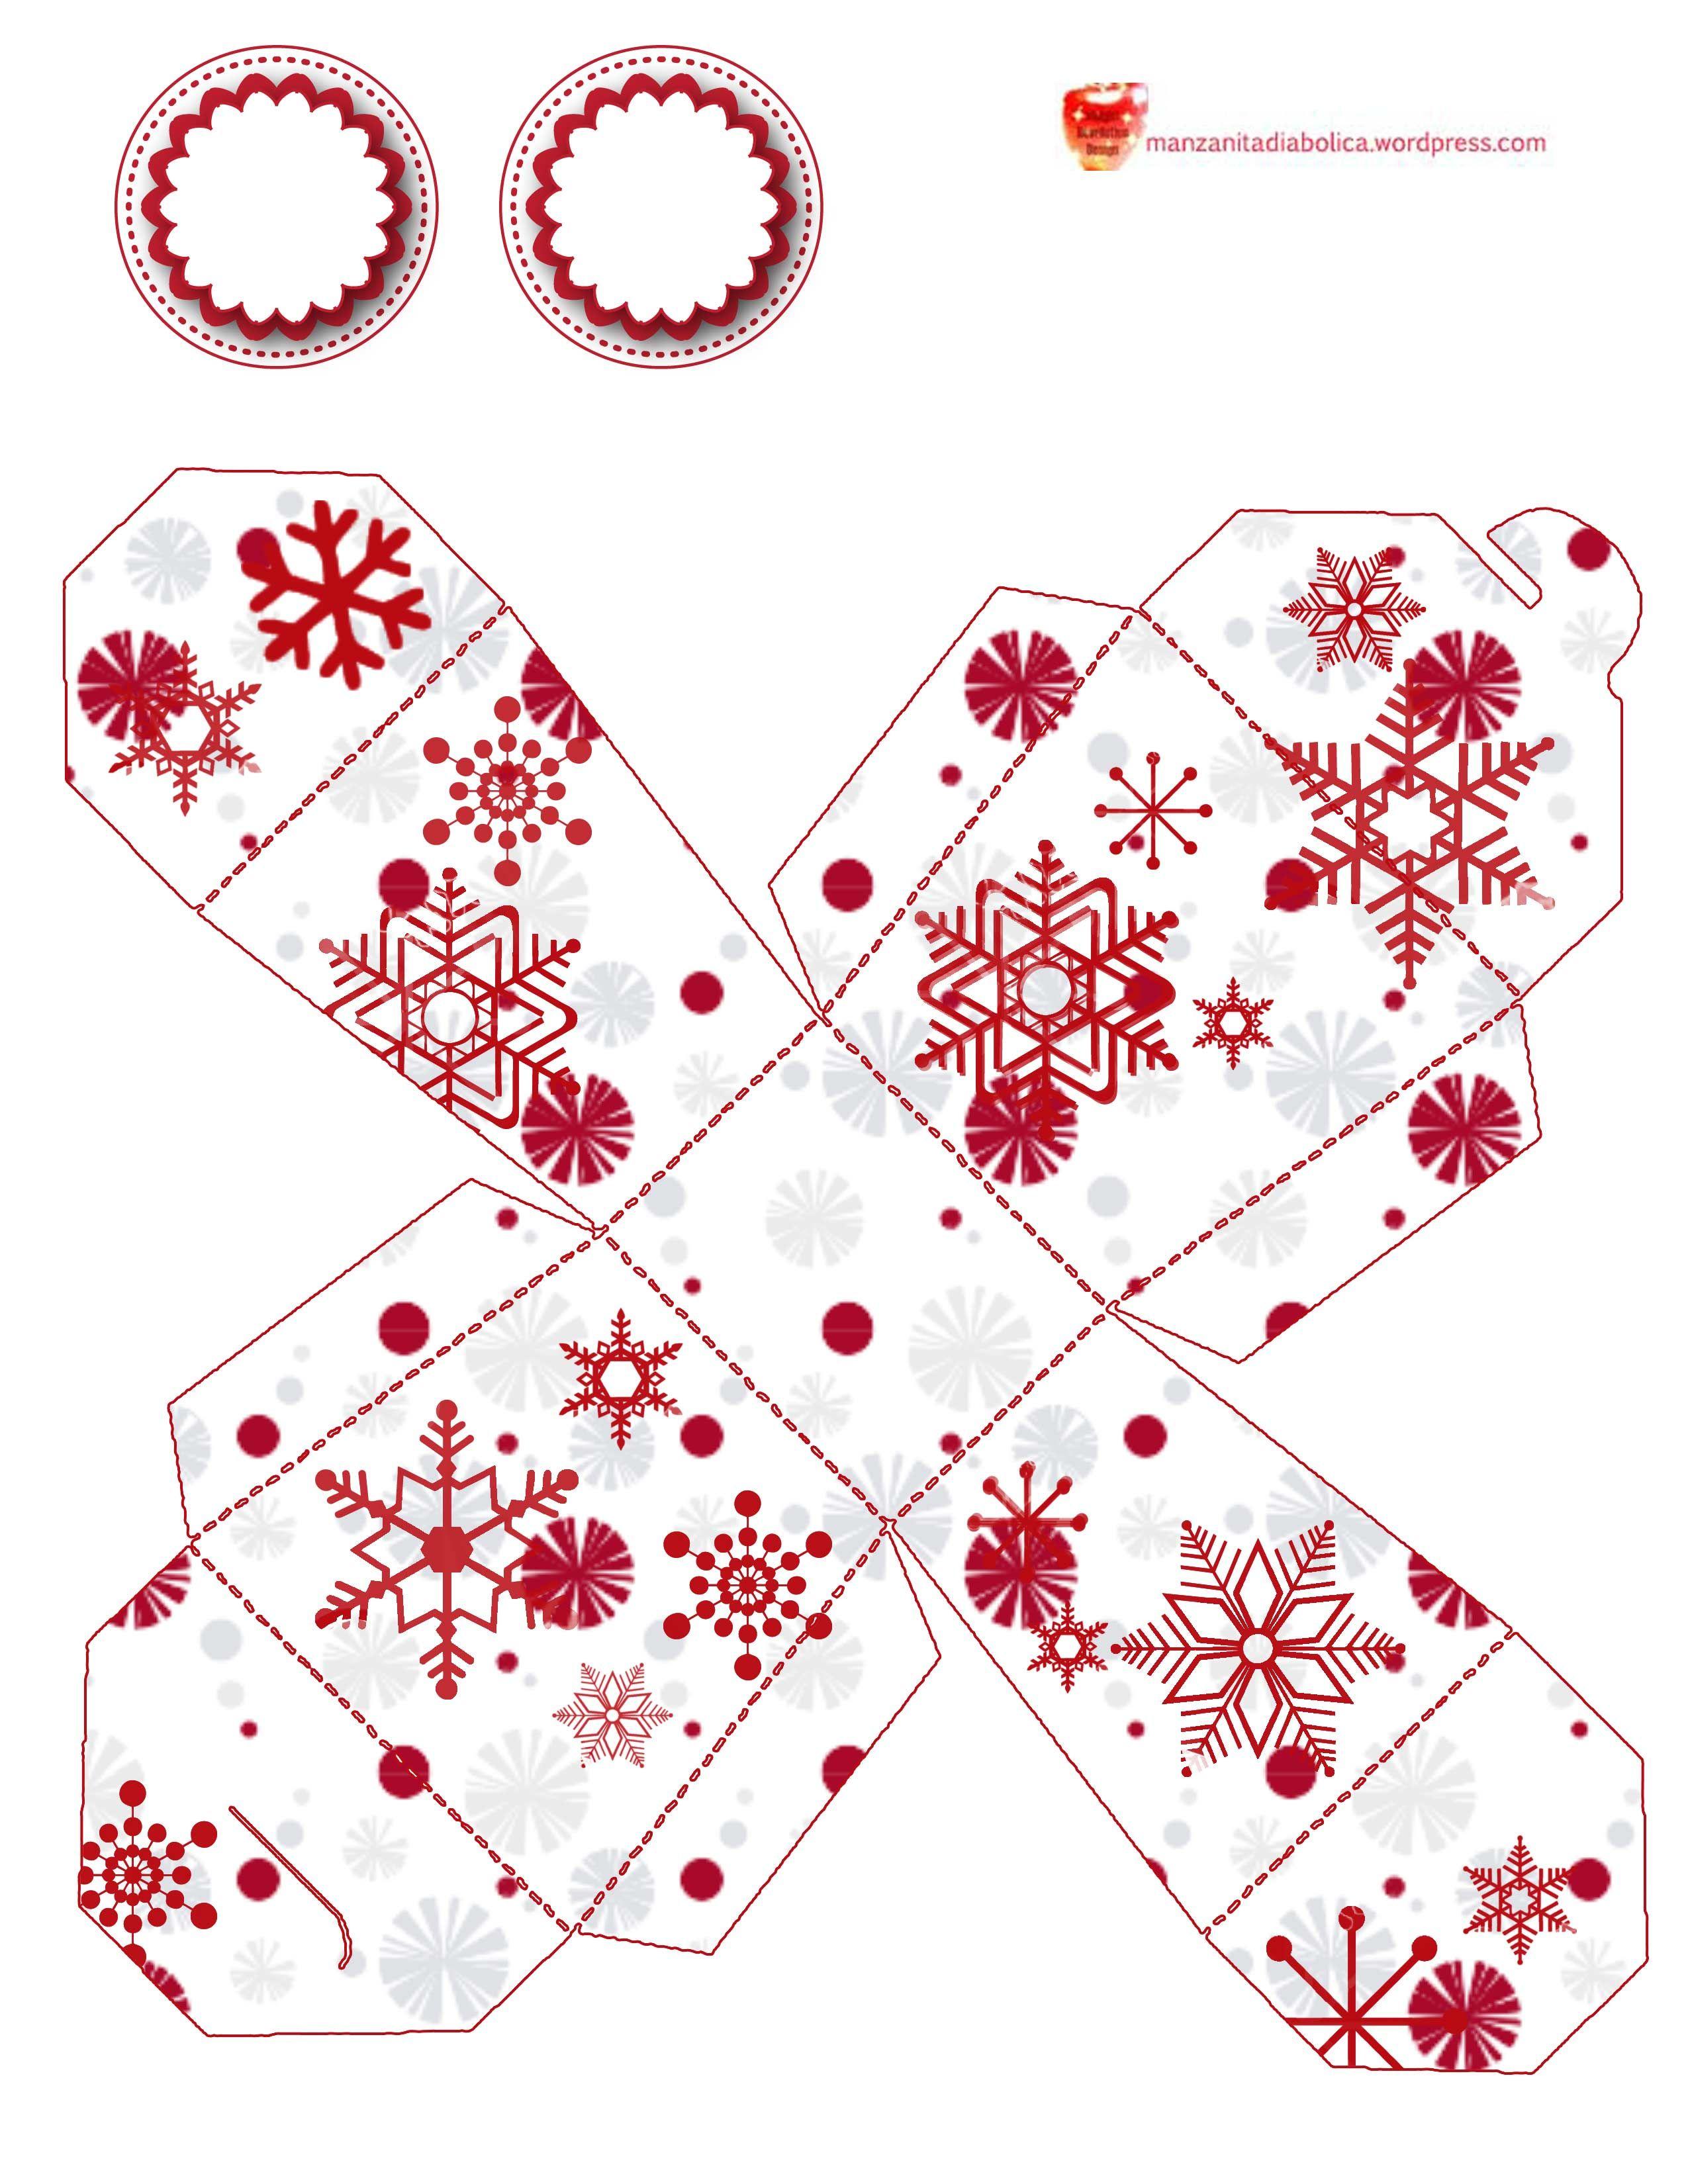 cajita navidad caja de